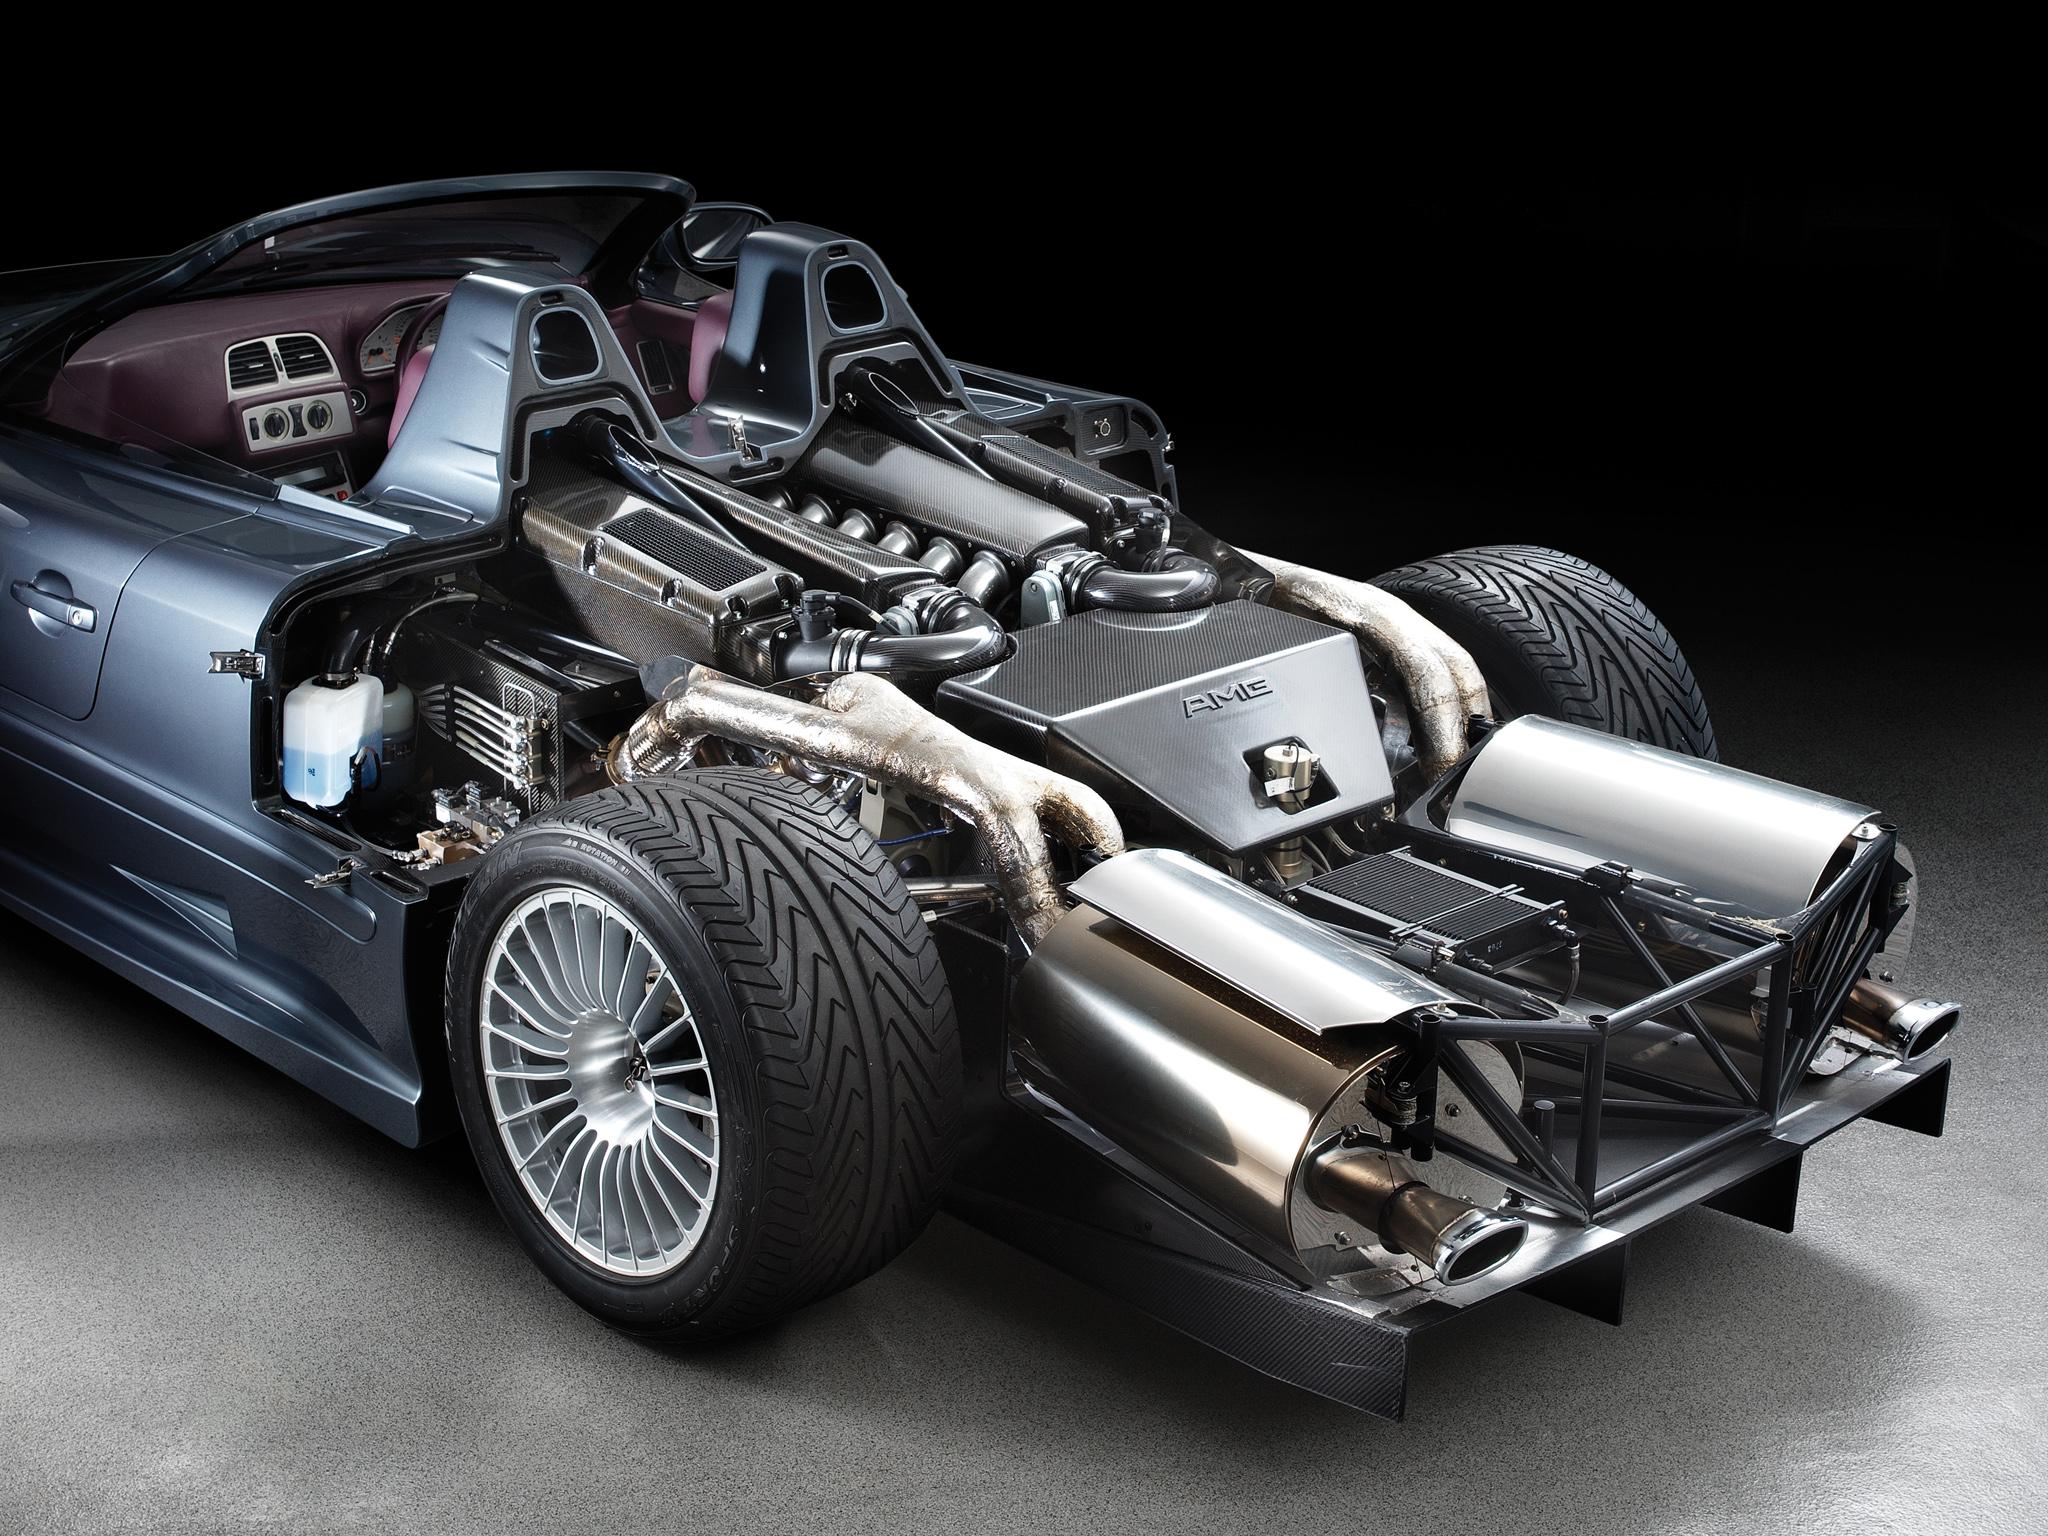 2002 Mercedes Benz CLK GTR AMG Roadster supercar supercars ...